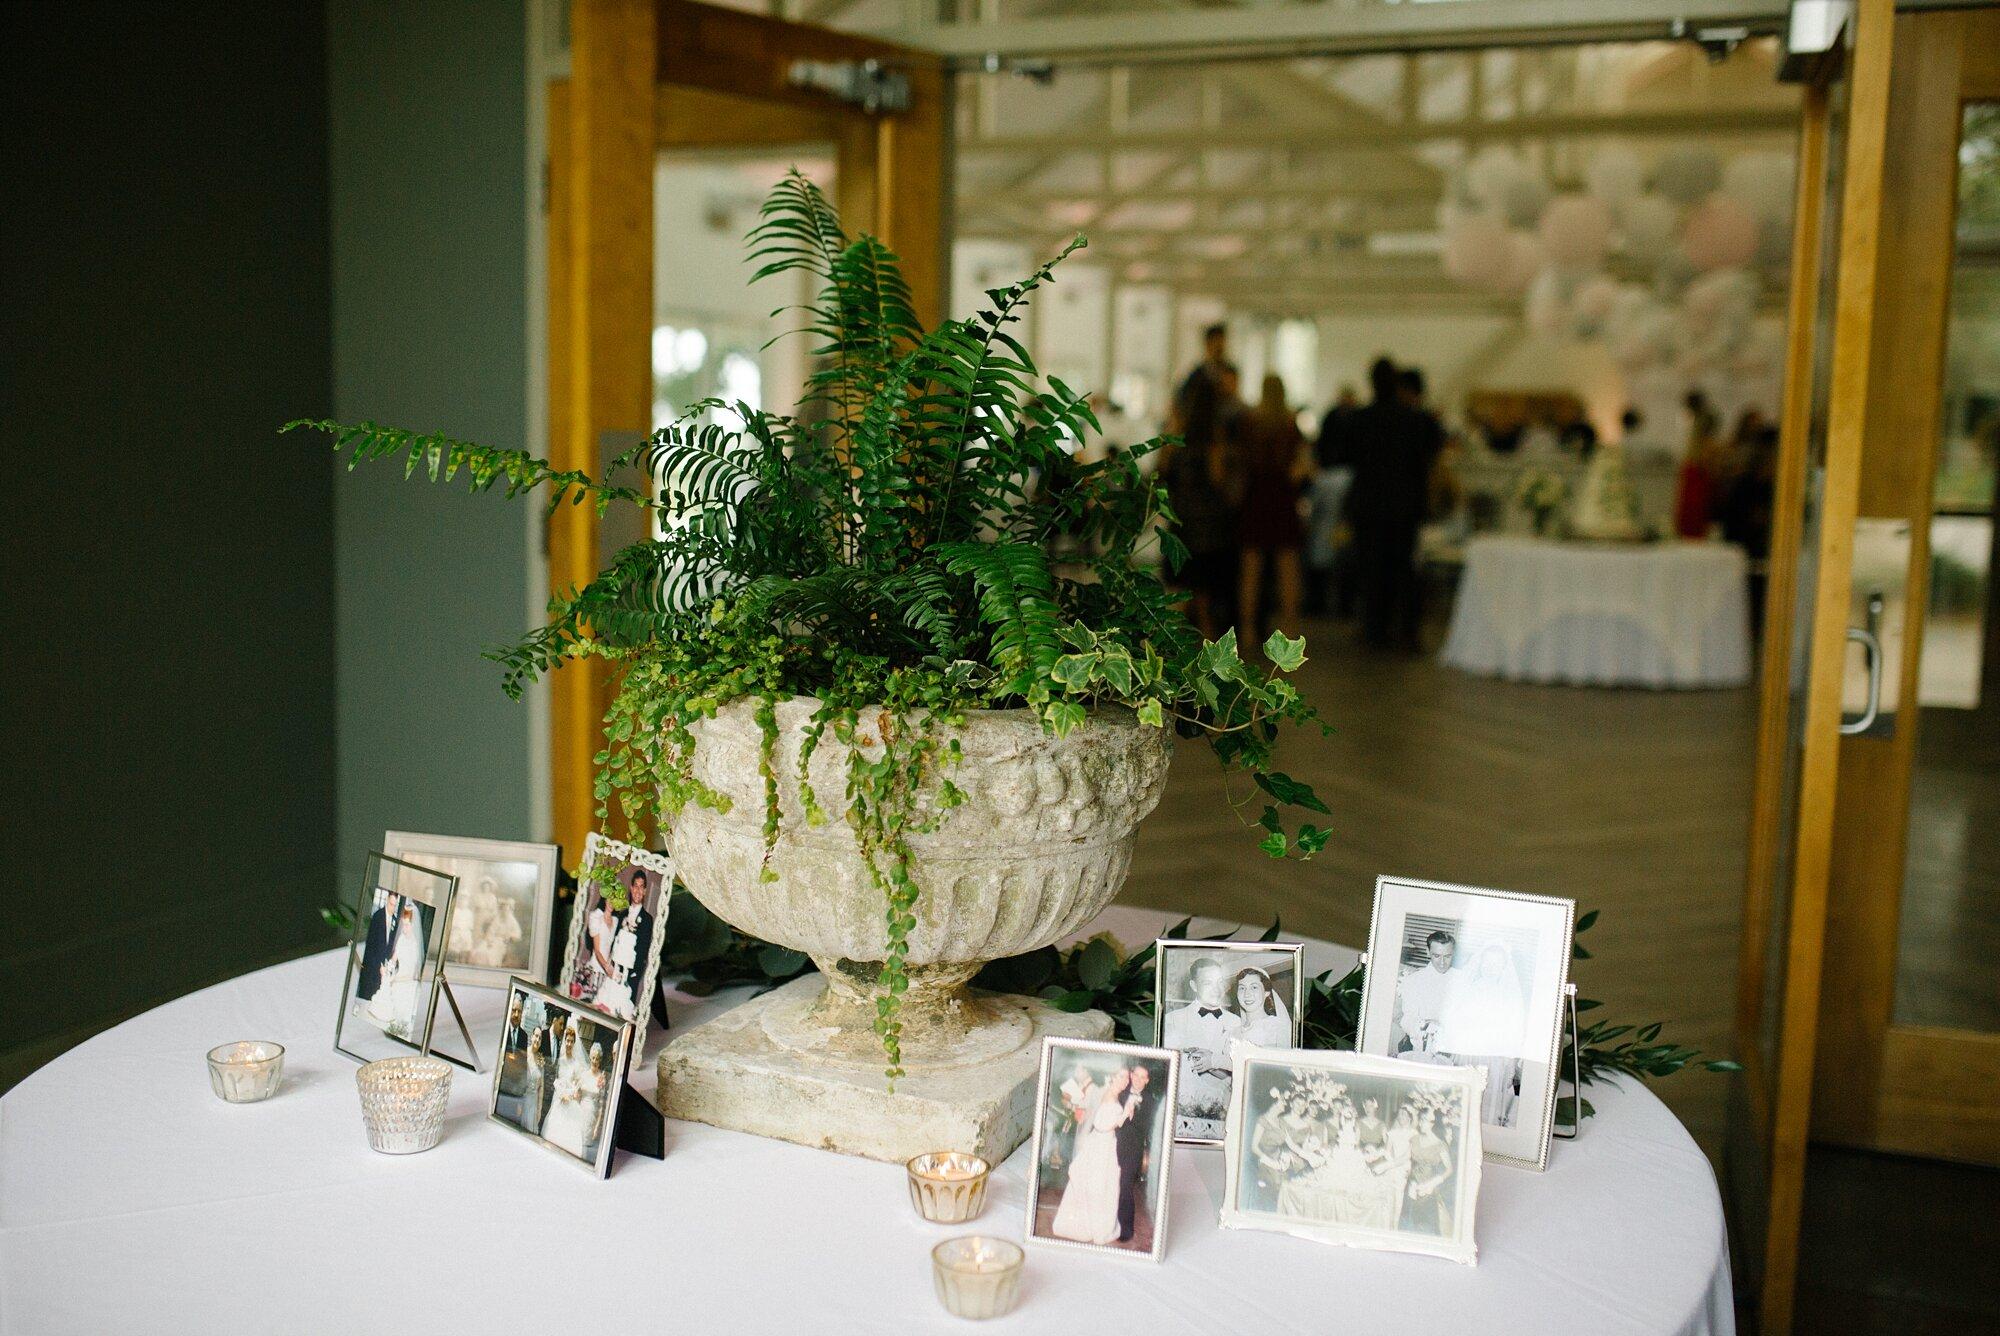 Bay_St_Louis_Wedding_Photographer_0594.jpg